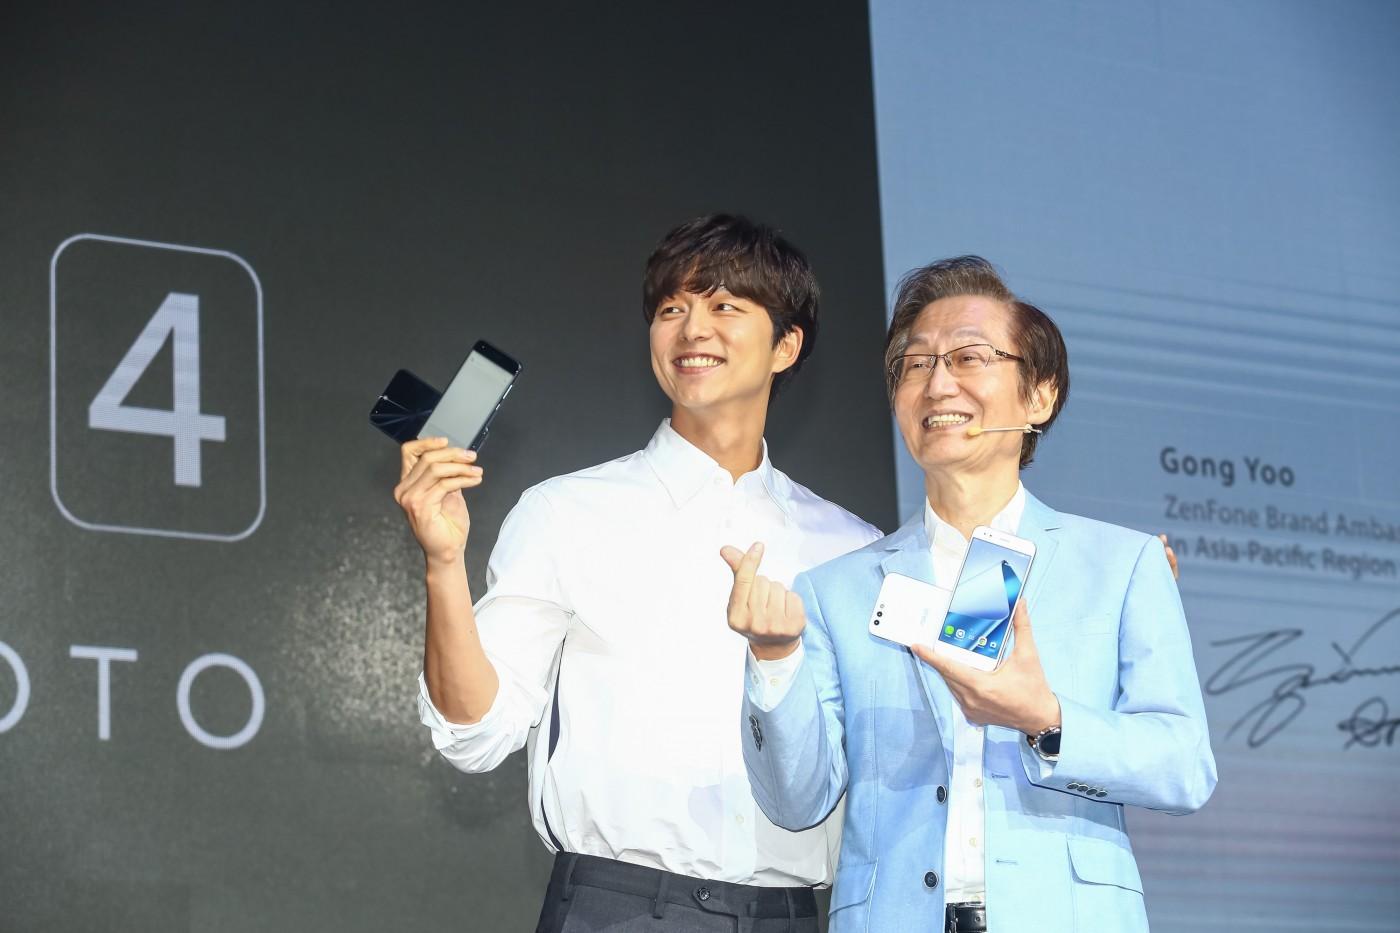 ZenFone不會消失!華碩發佈第一份手機獨立財報,揭台灣品牌浴血奮戰史